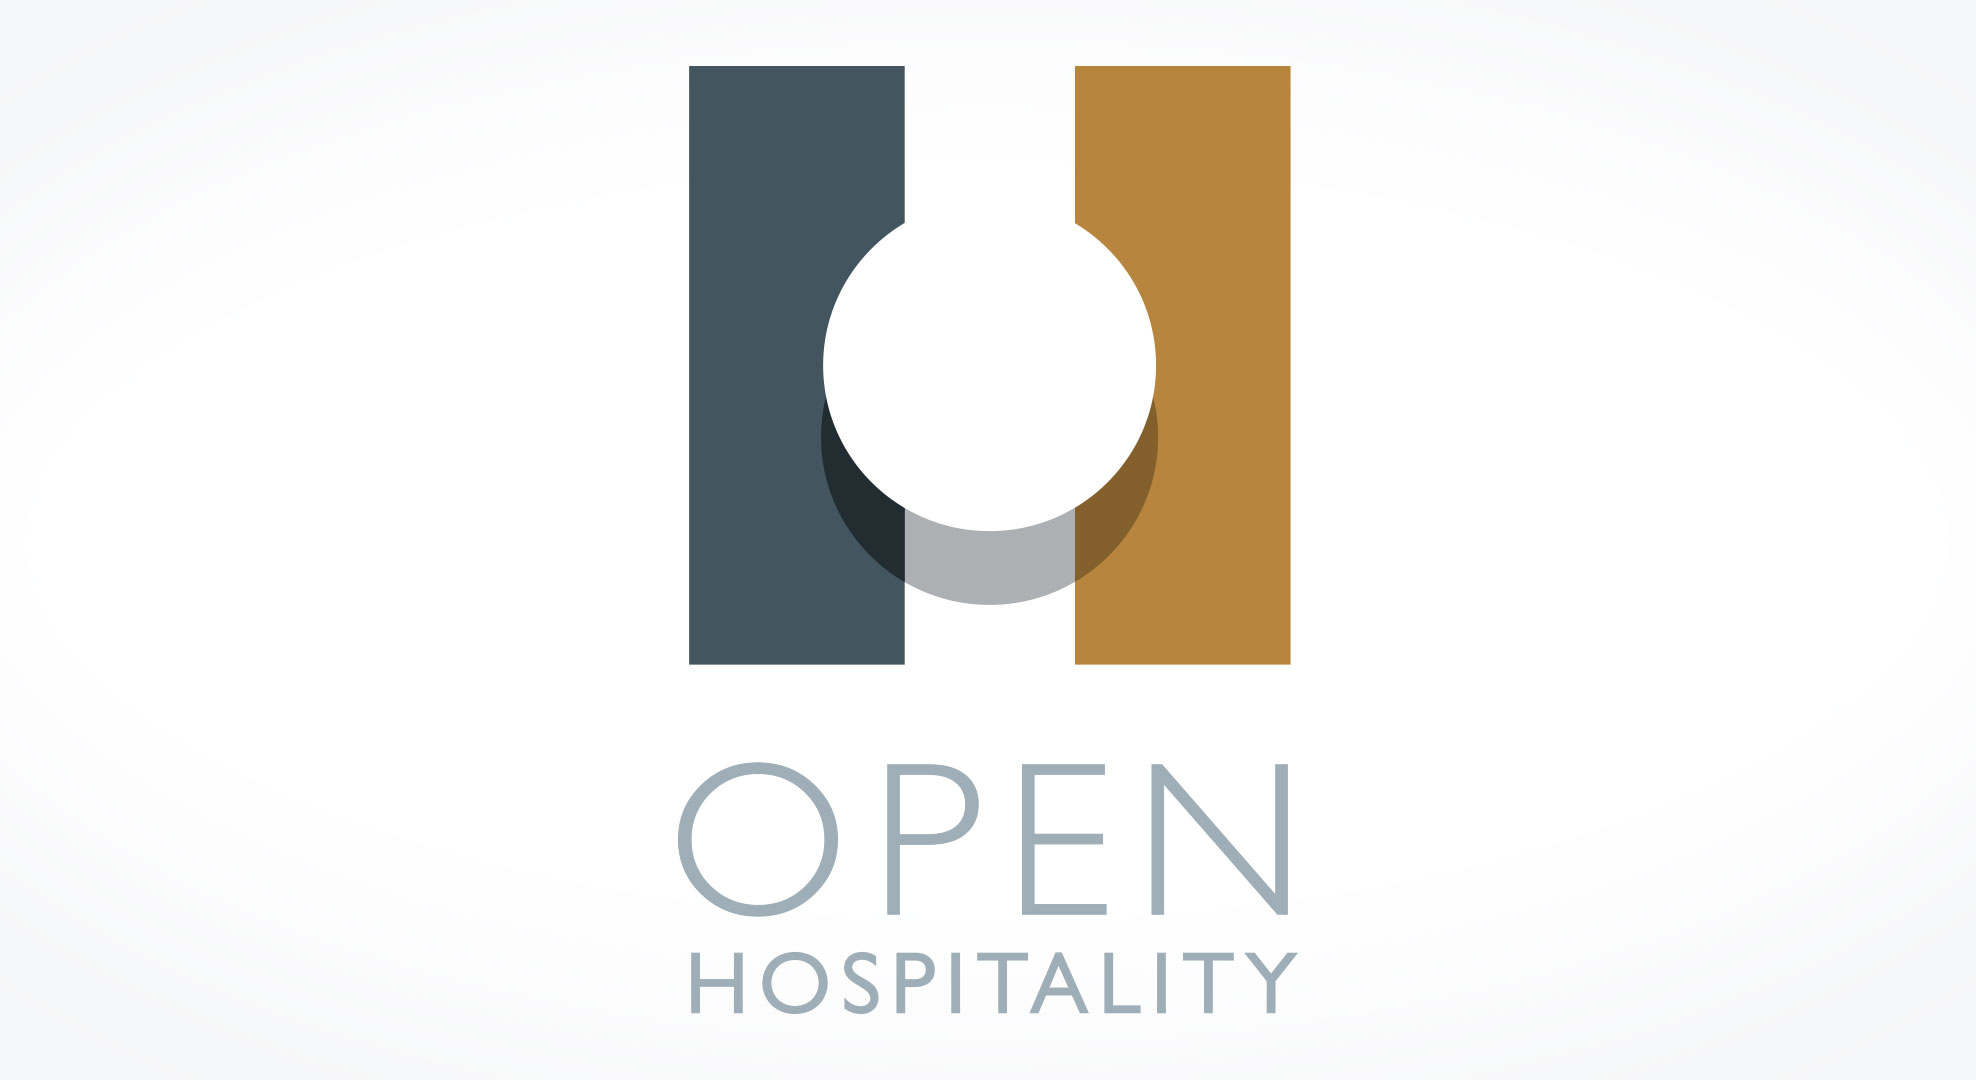 Open Hospitality